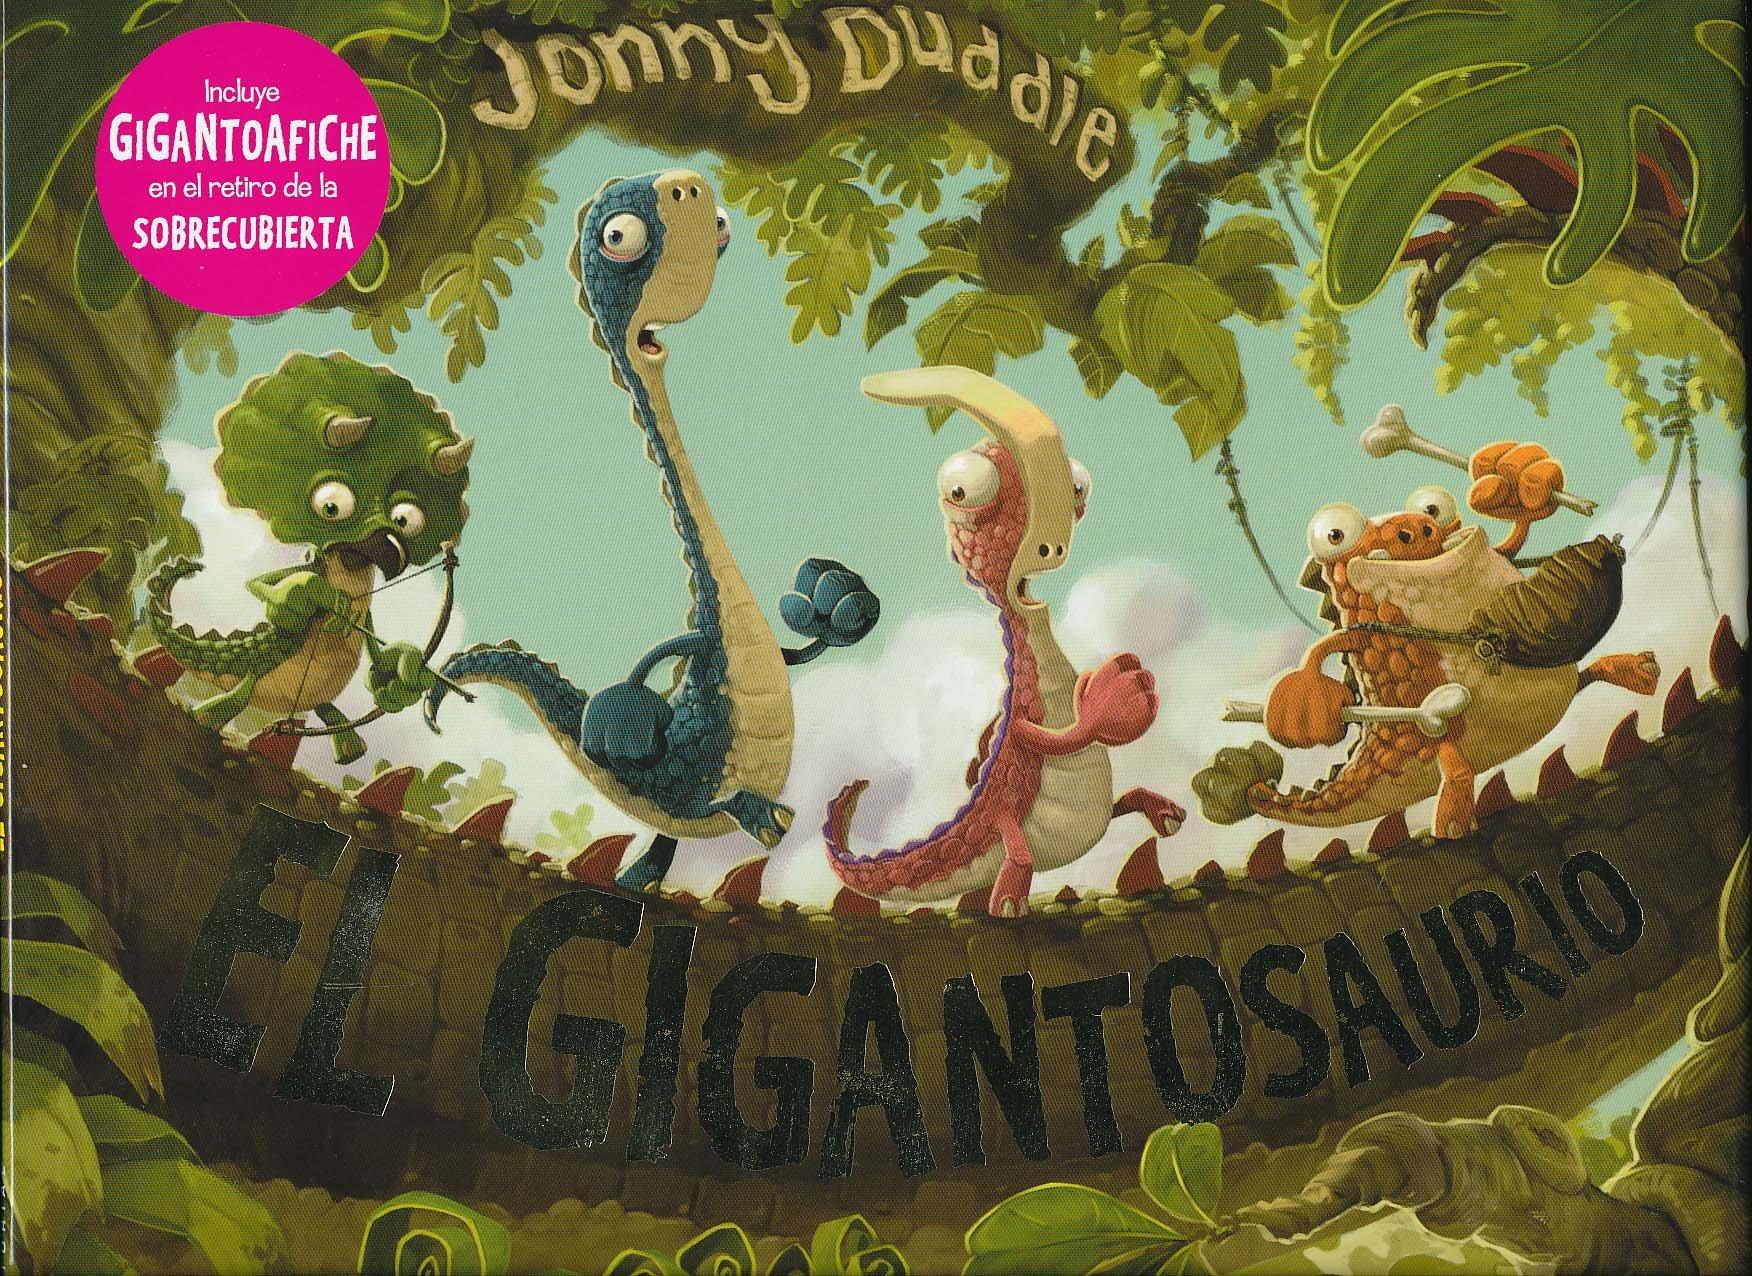 El gigantosaurio (Spanish Edition) pdf